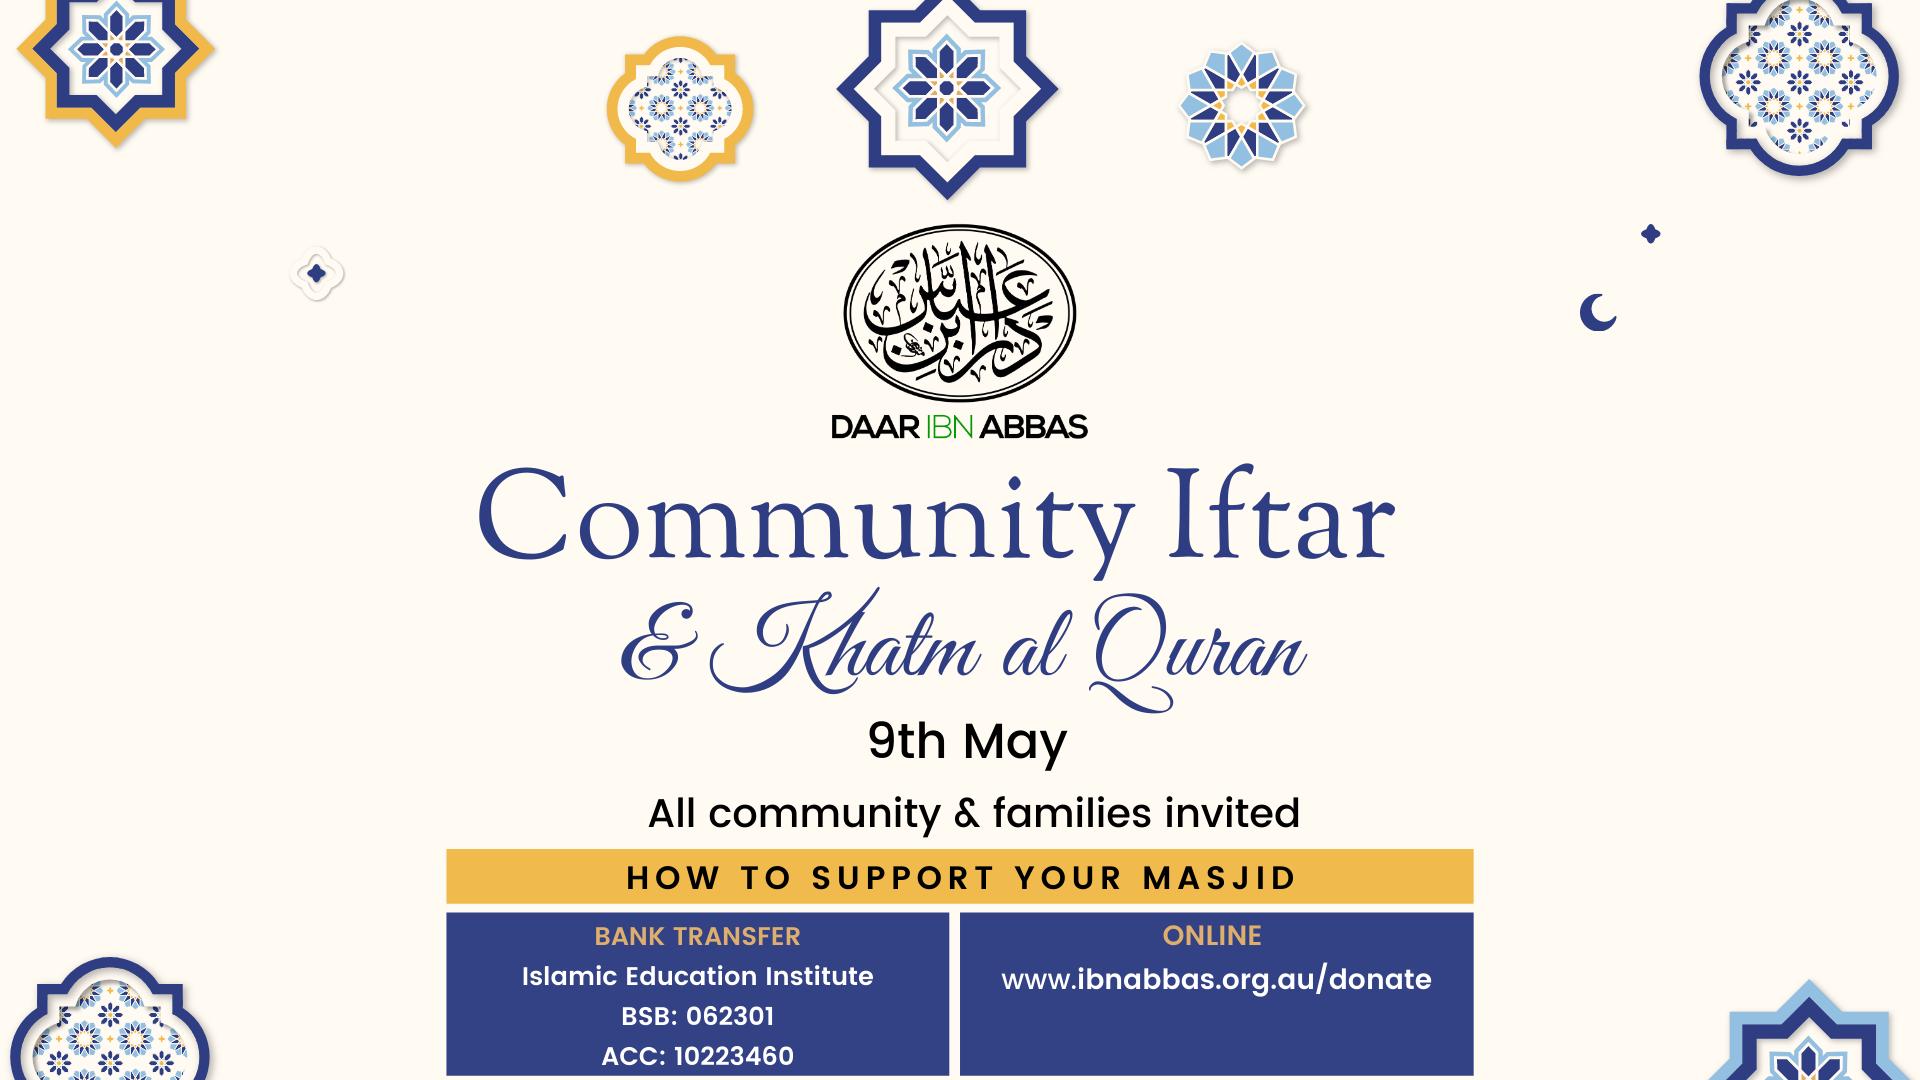 Community Iftar